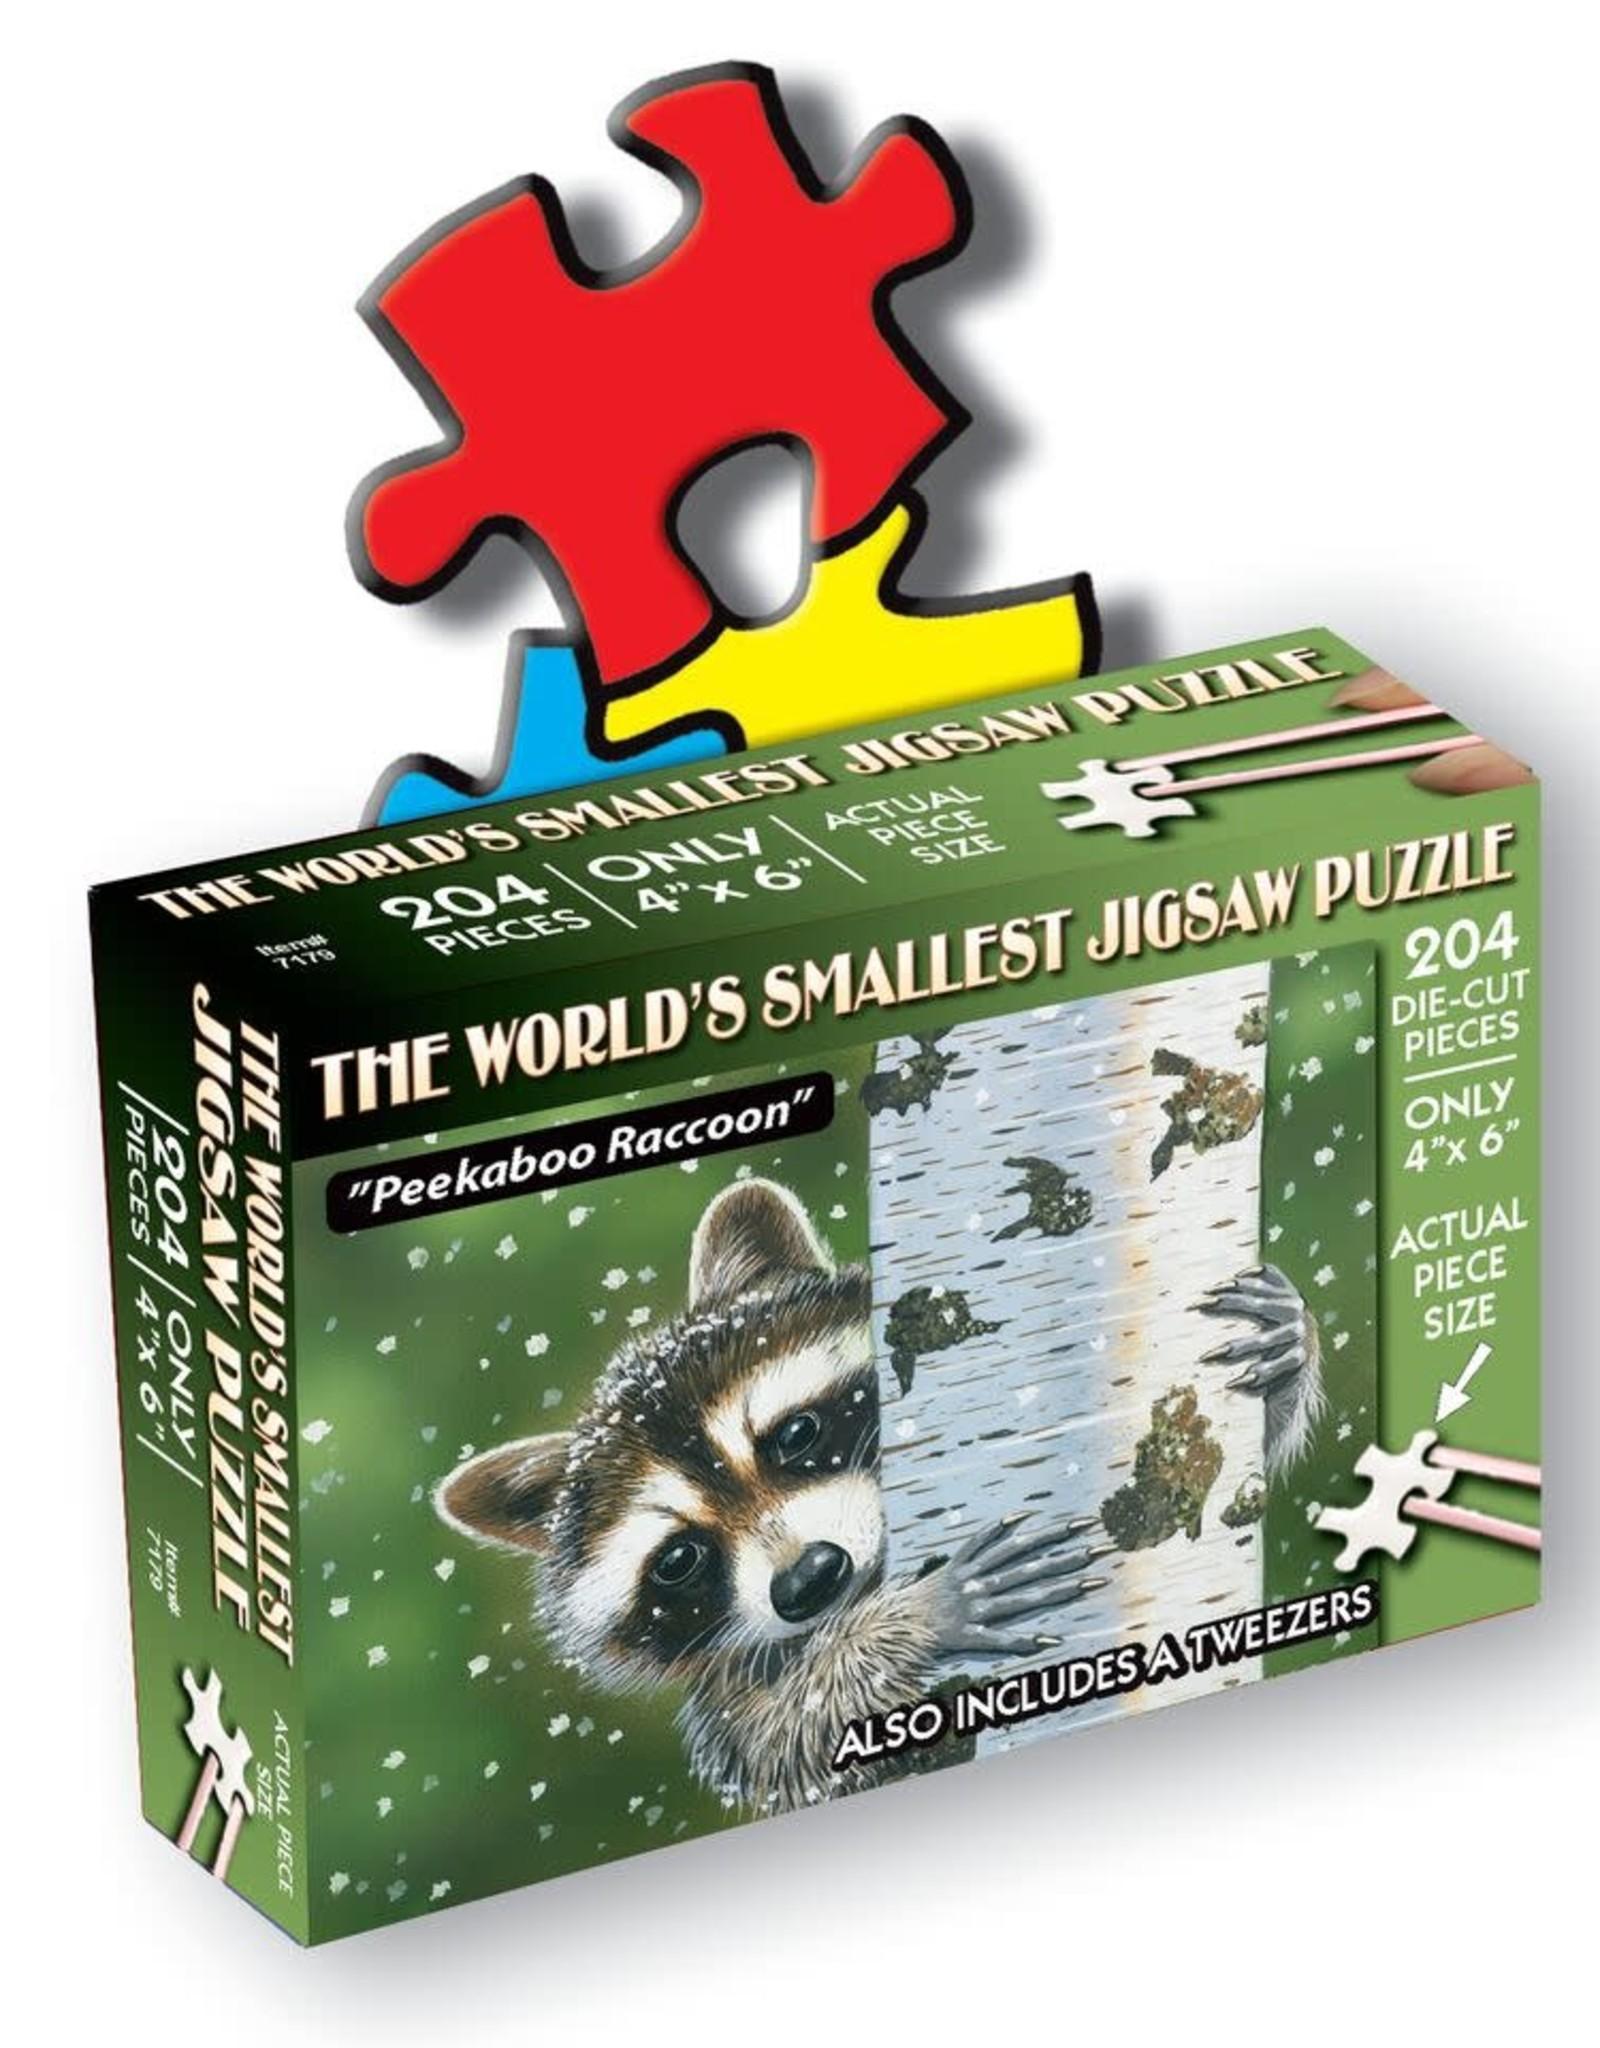 World's Smallest Jigsaw Puzzle: Peekaboo Raccoon 234 PCS